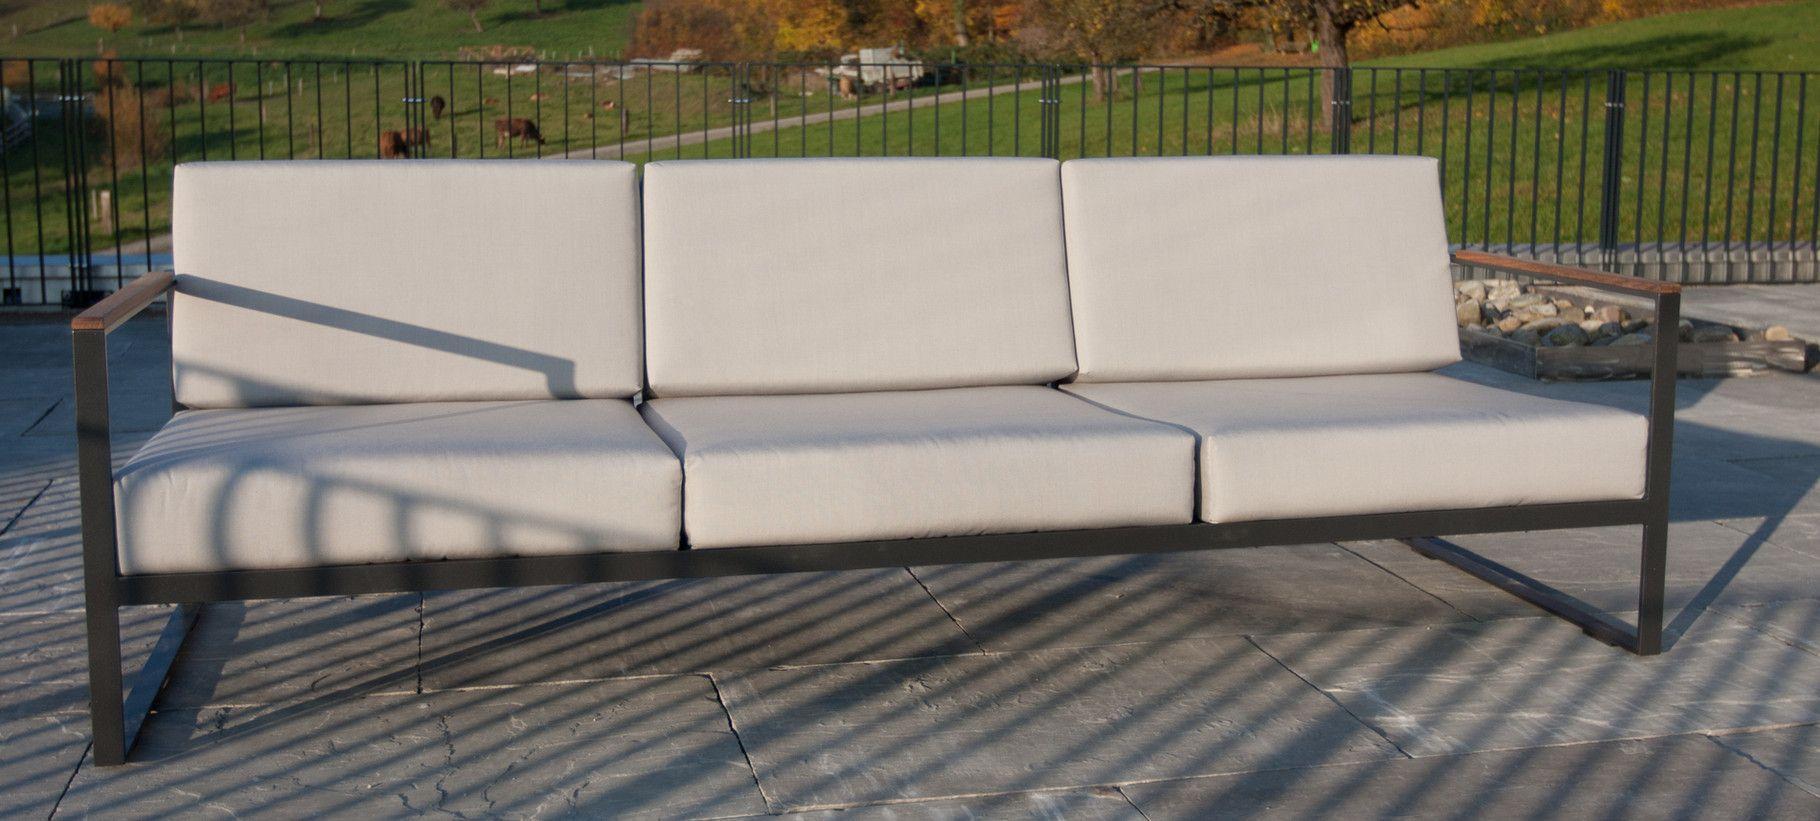 Garten Lounge Möbel Metall